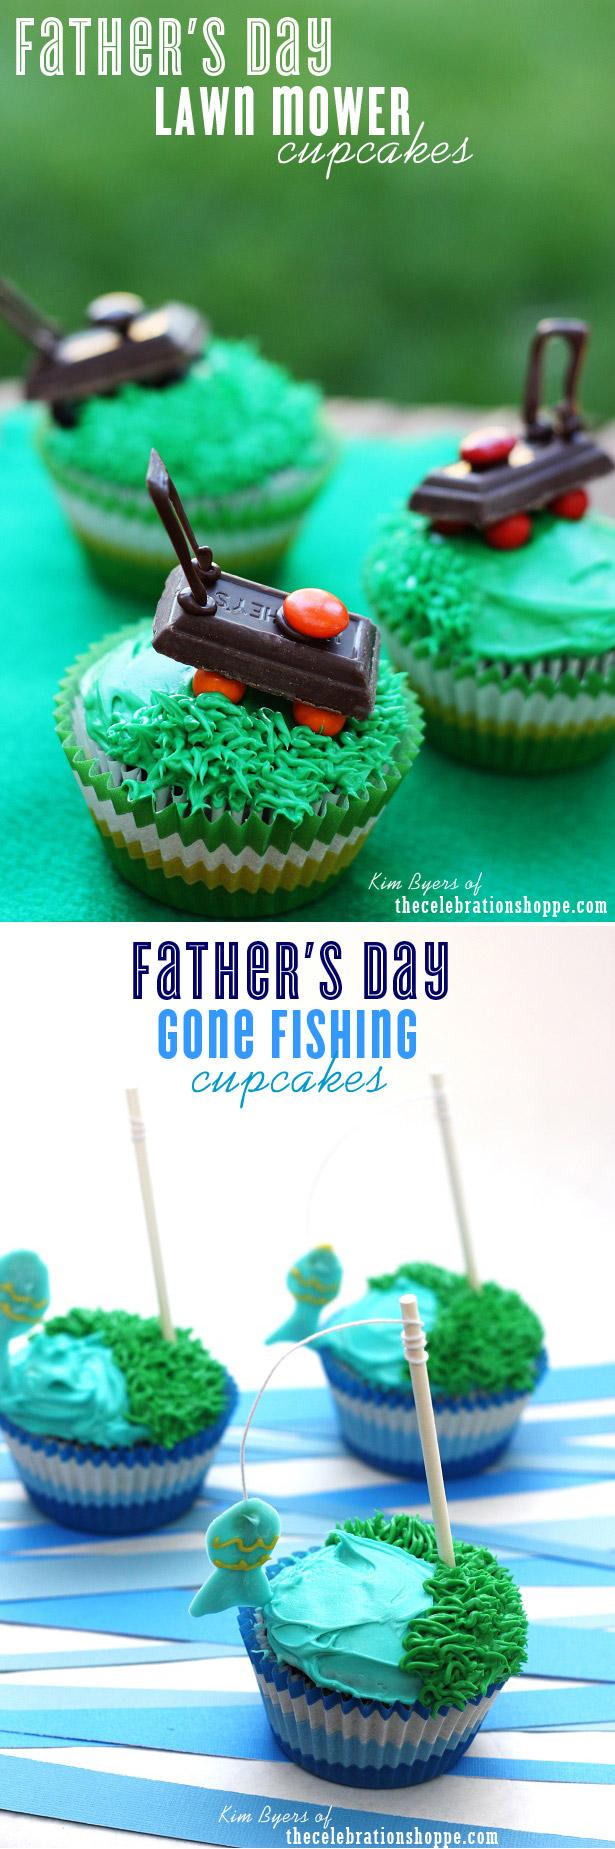 Father's Day Cupcake Ideas | Kim Byers, TheCelebrationShoppe.com